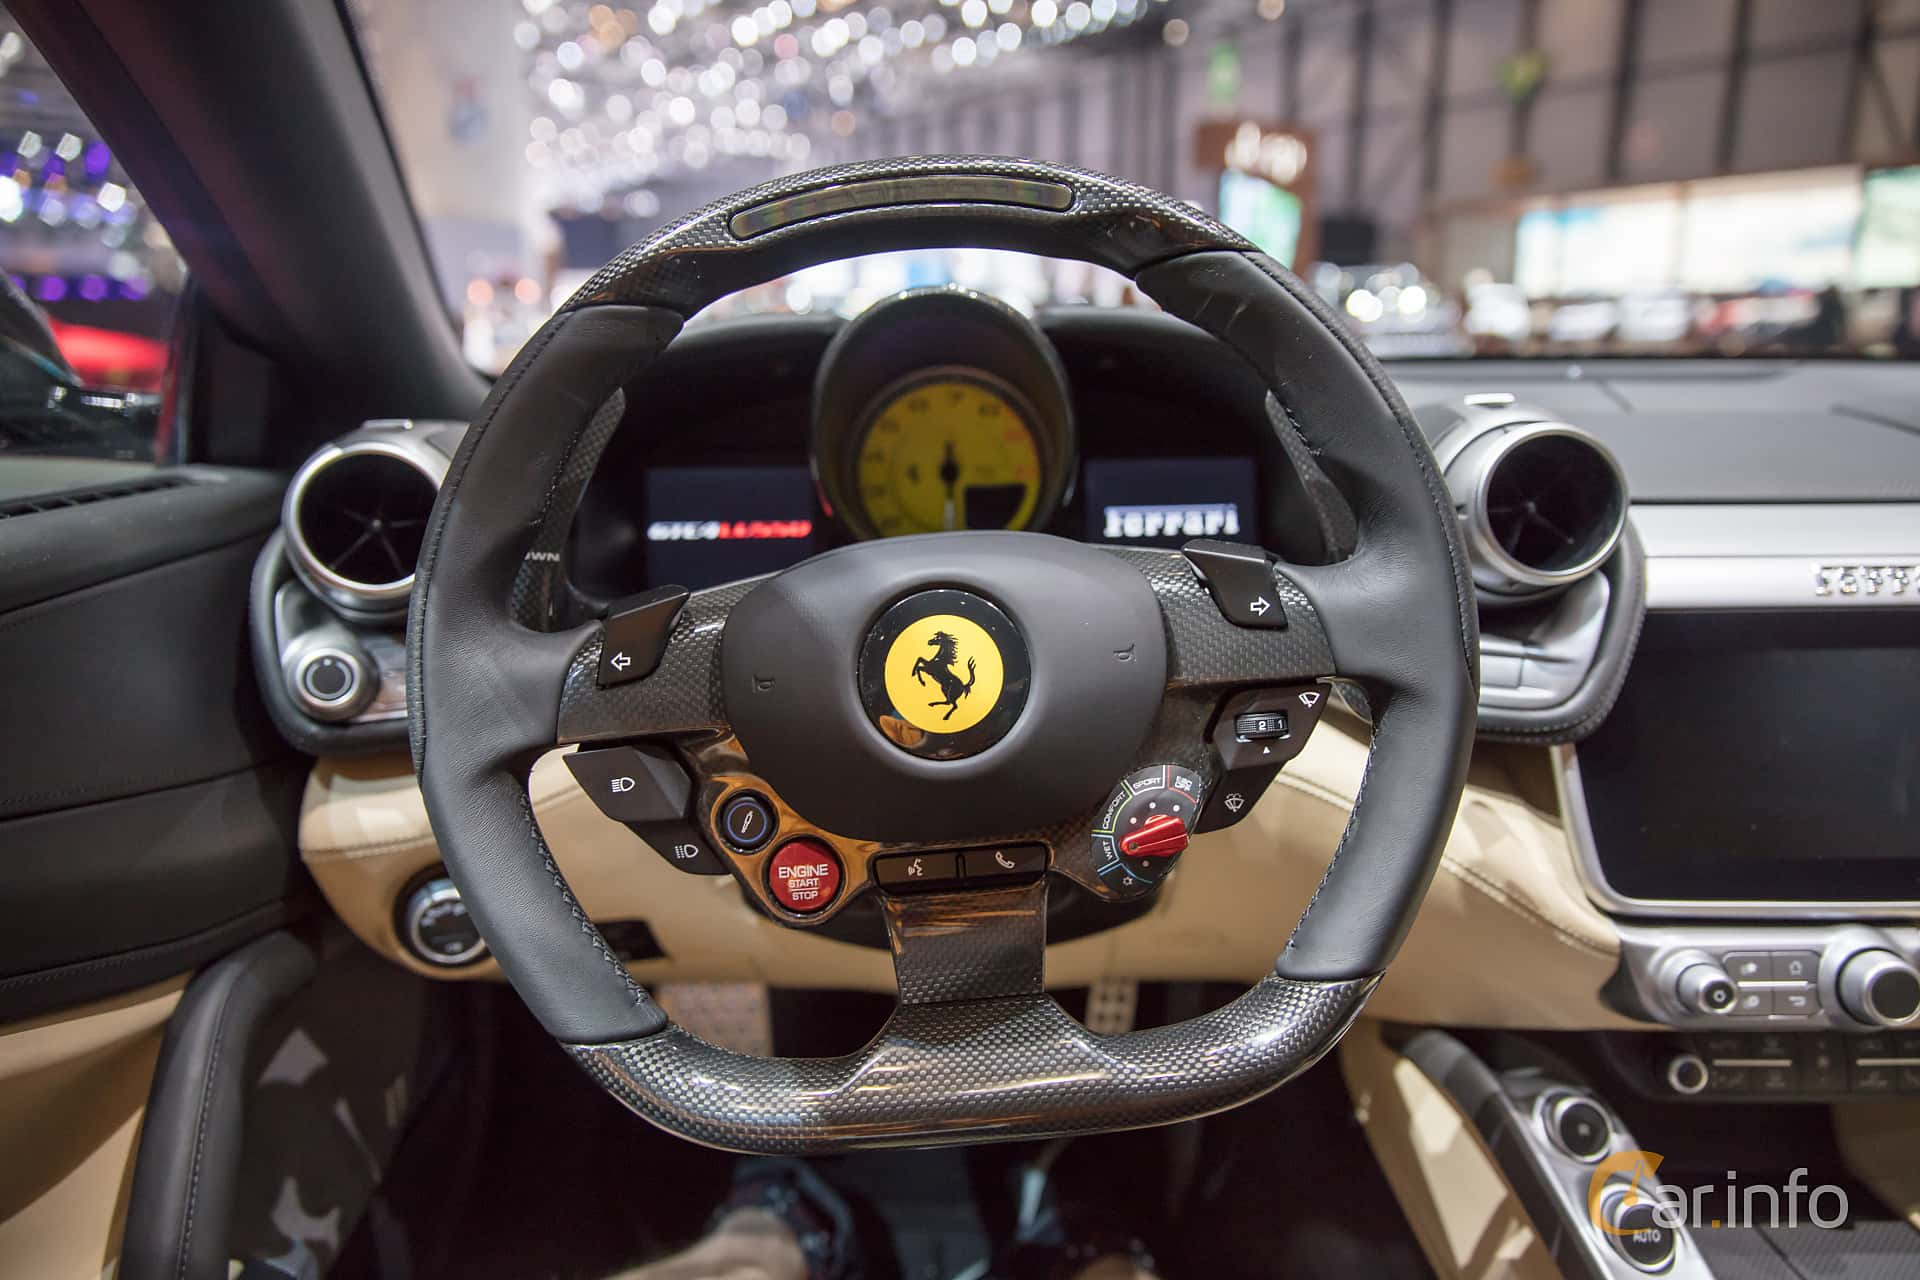 Ferrari gtc4 lusso 6 3 v12 dct 690hk 2017 at geneva - 2017 ferrari california interior ...